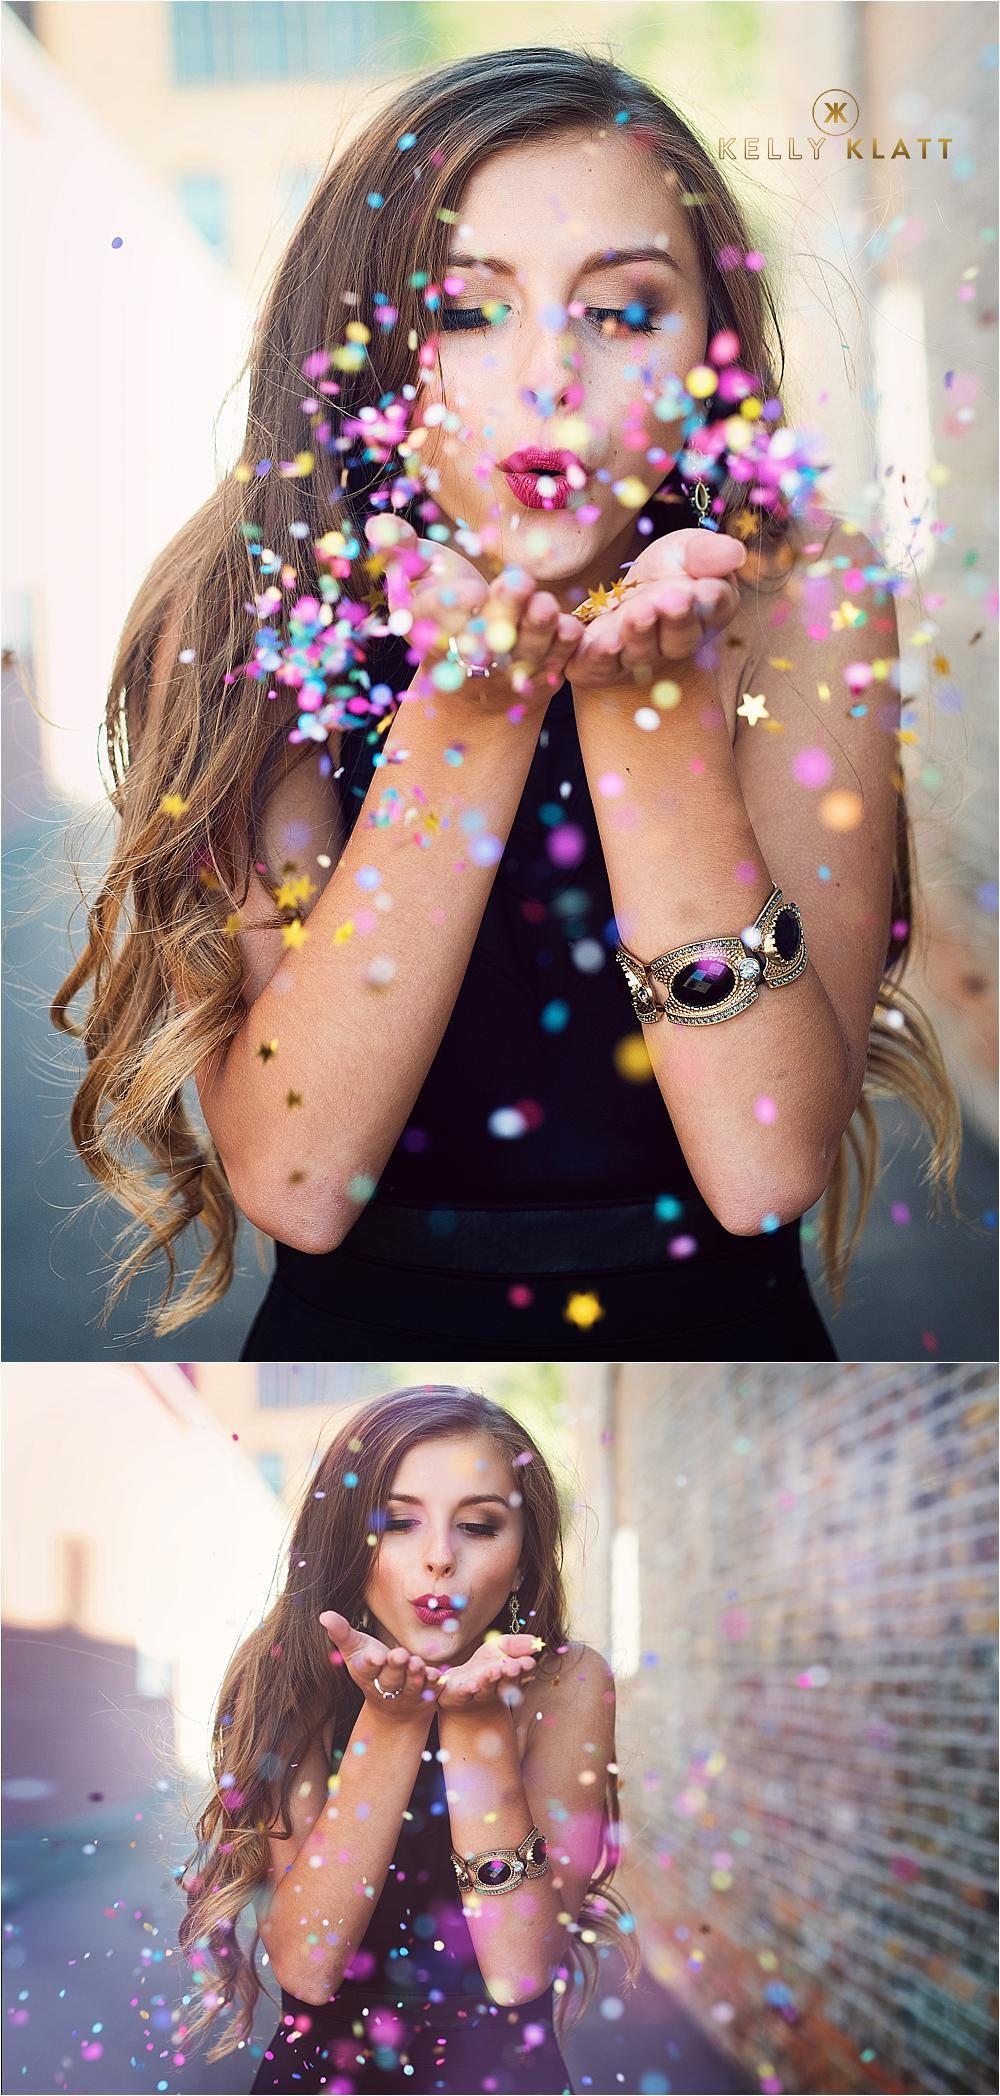 Photography By Kelly Klatt Copyright 2015 Photography